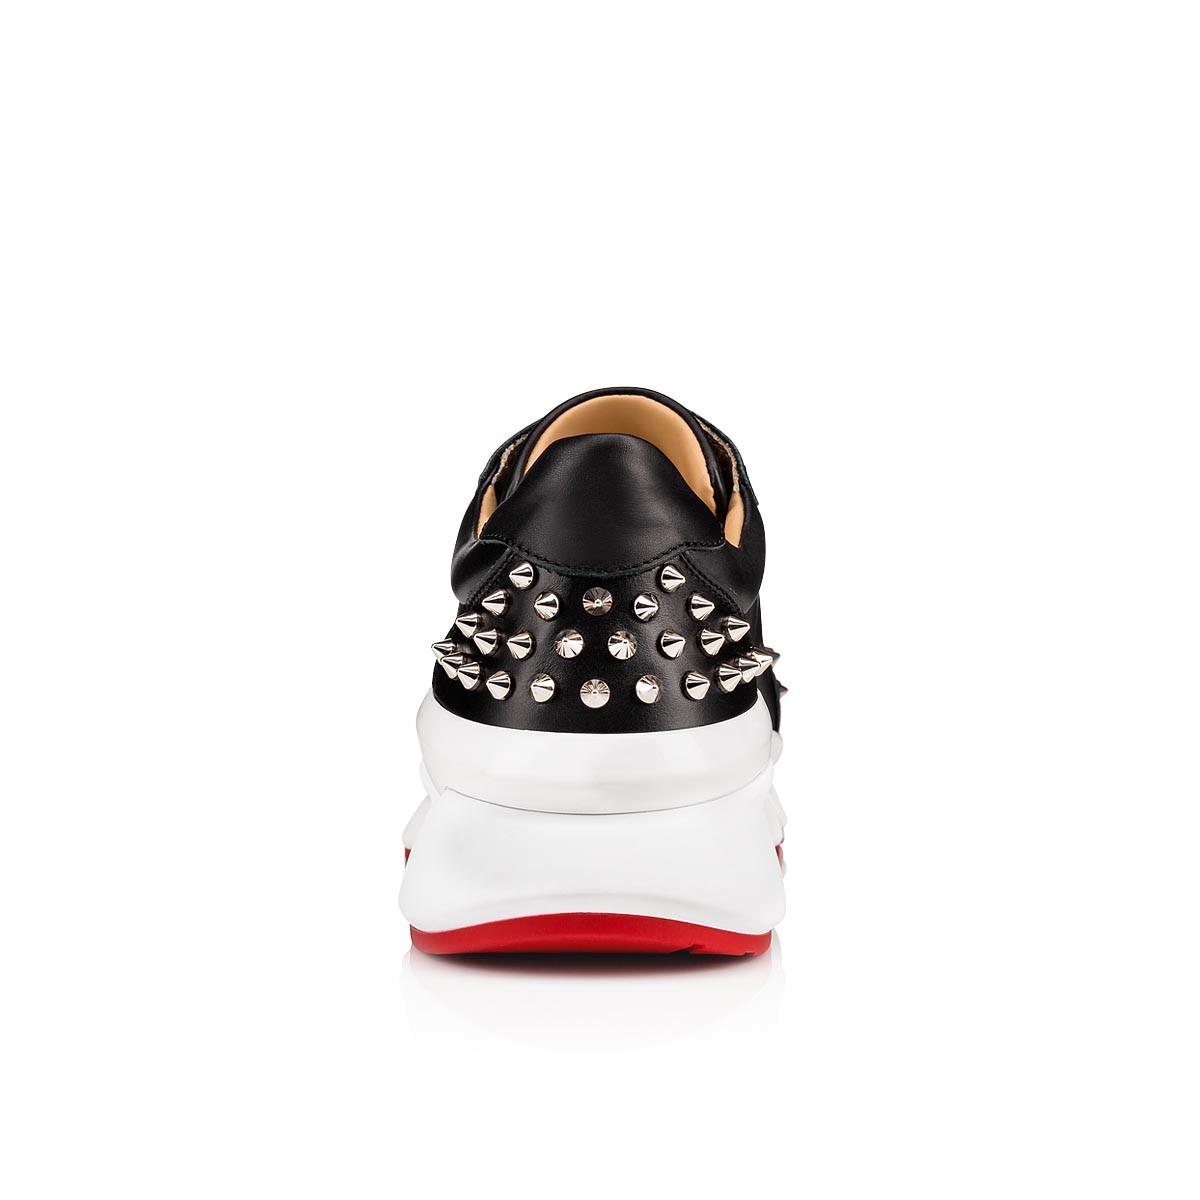 Shoes - Vrs 2018 - Christian Louboutin